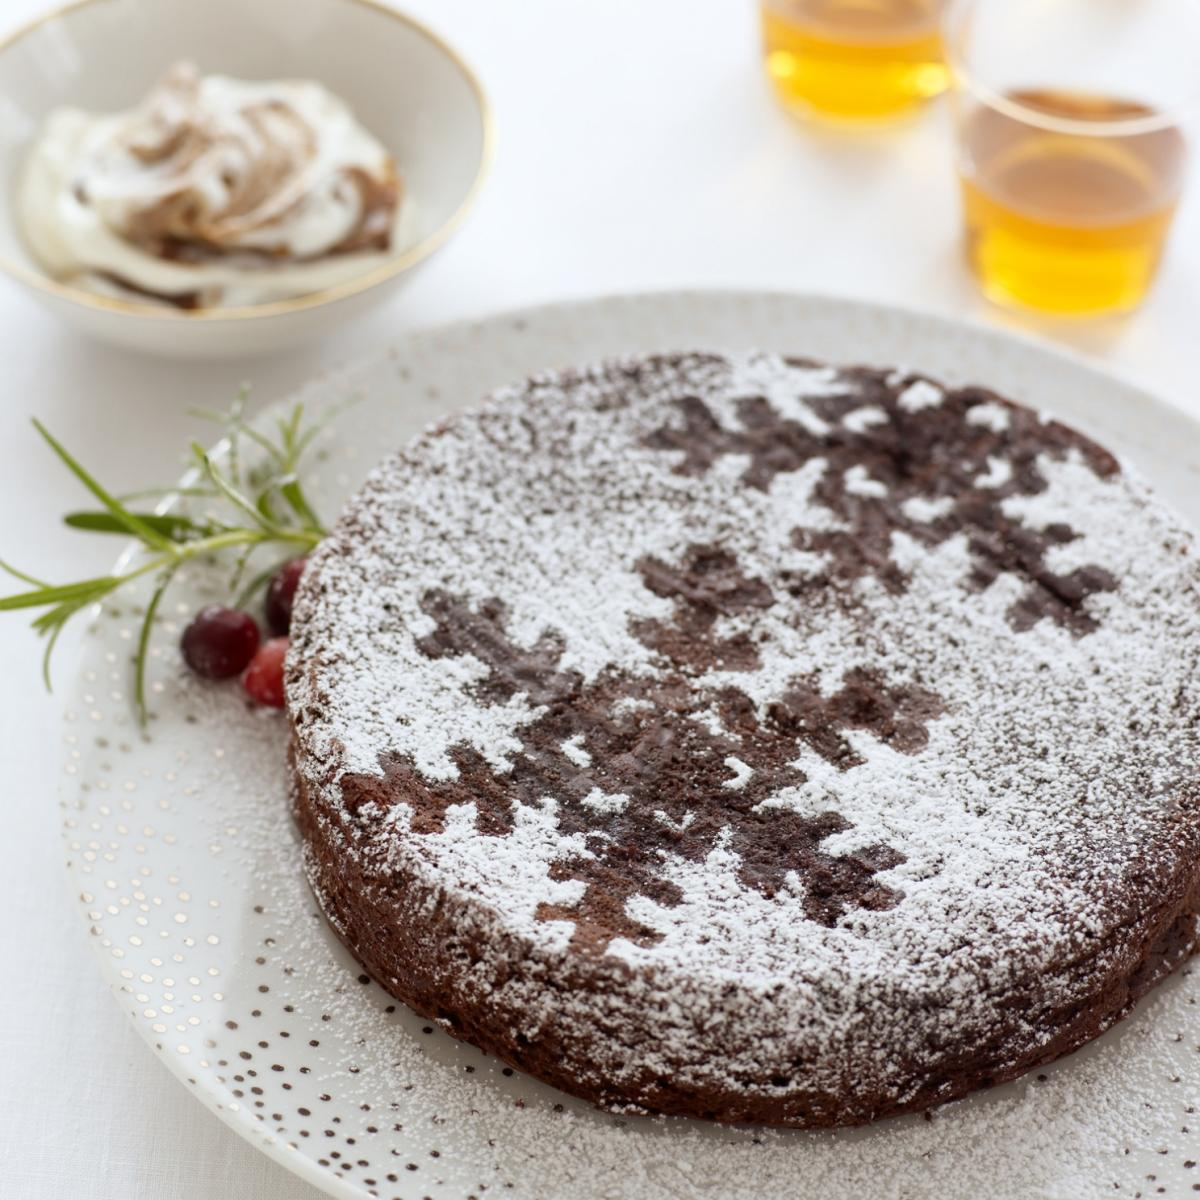 Happy fallen chocolate souffle with armagnac prunes